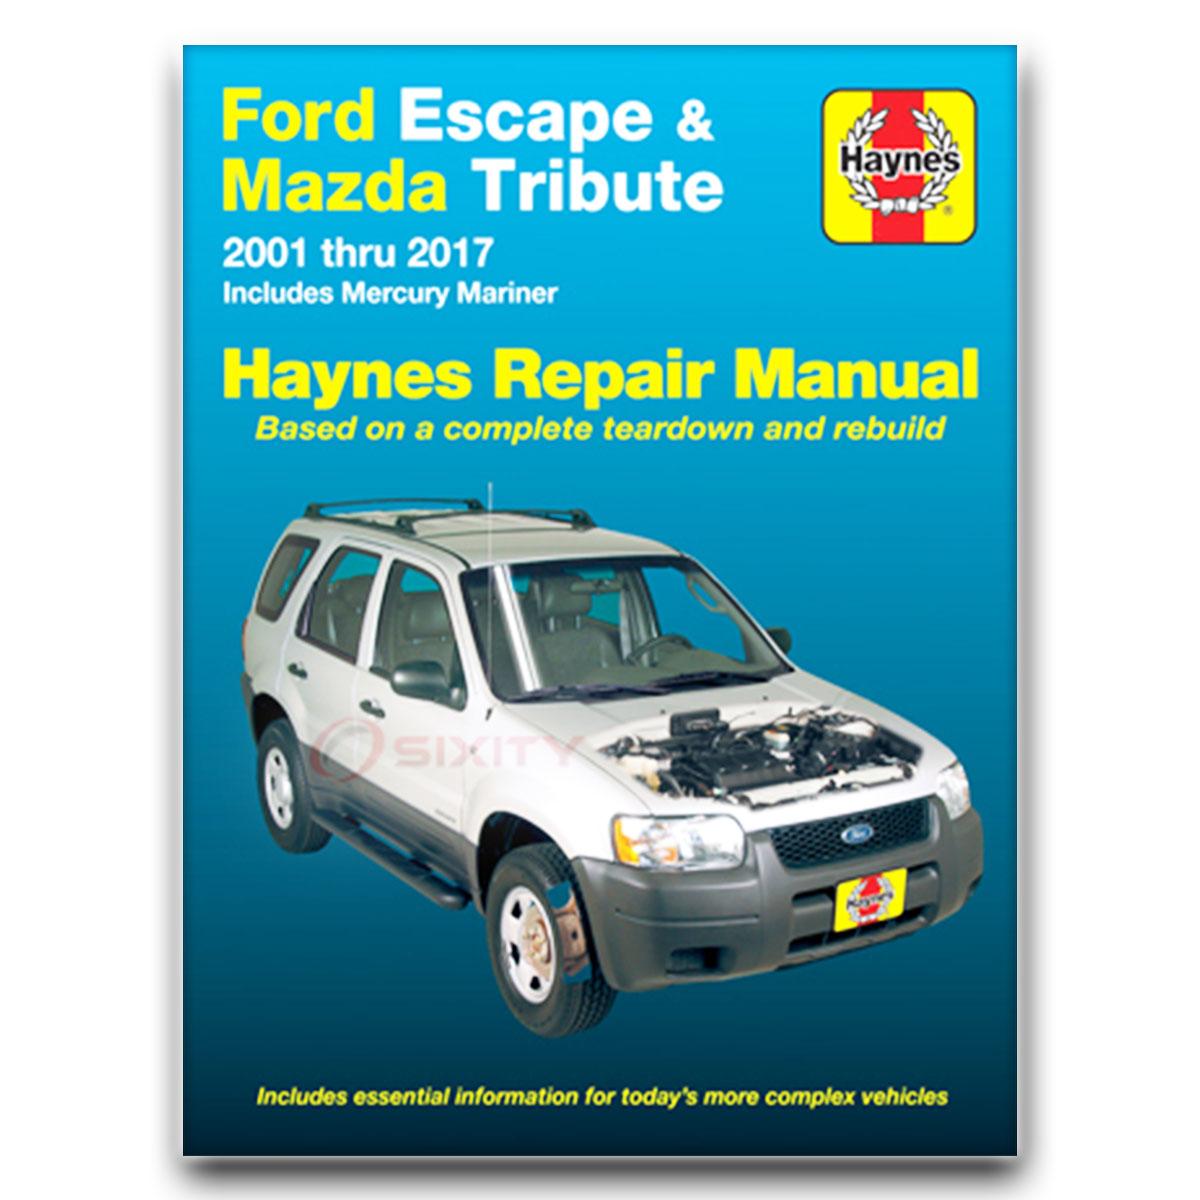 haynes ford escape mazda tribute 01 11 mercury mariner 05 11 repair rh ebay com mazda tribute 2001 service manual mazda tribute 2001 workshop manual